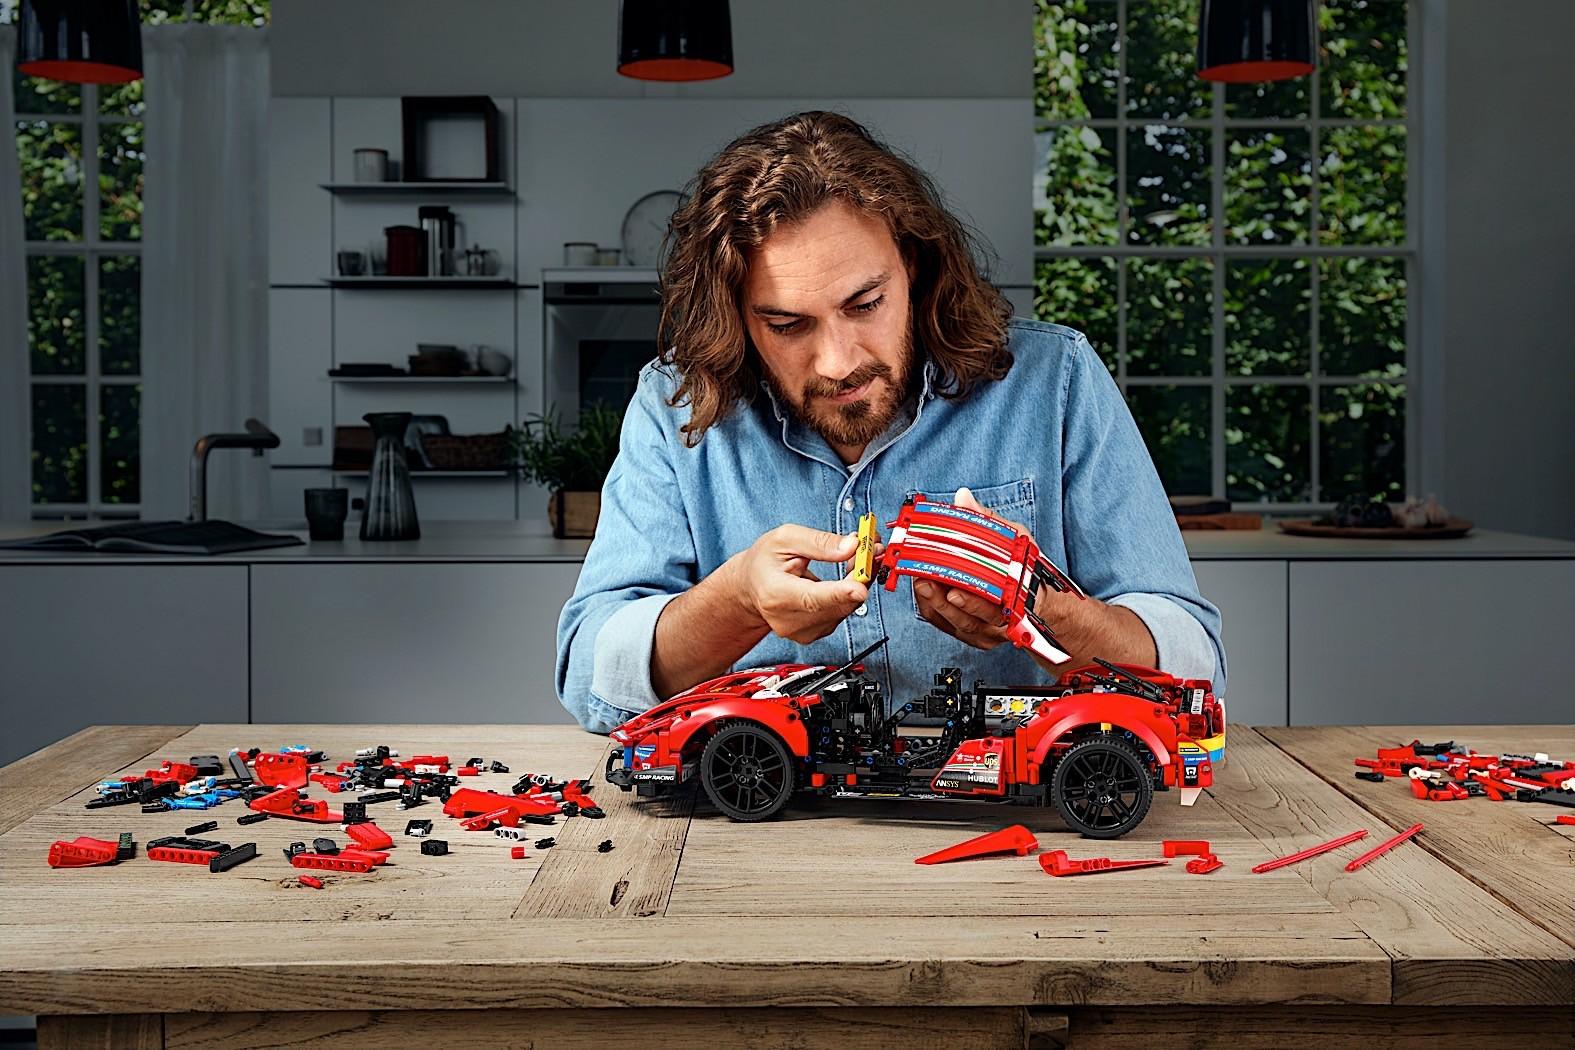 Lego-Technic-Ferrari-488-GTE-AF-Corse-51-11